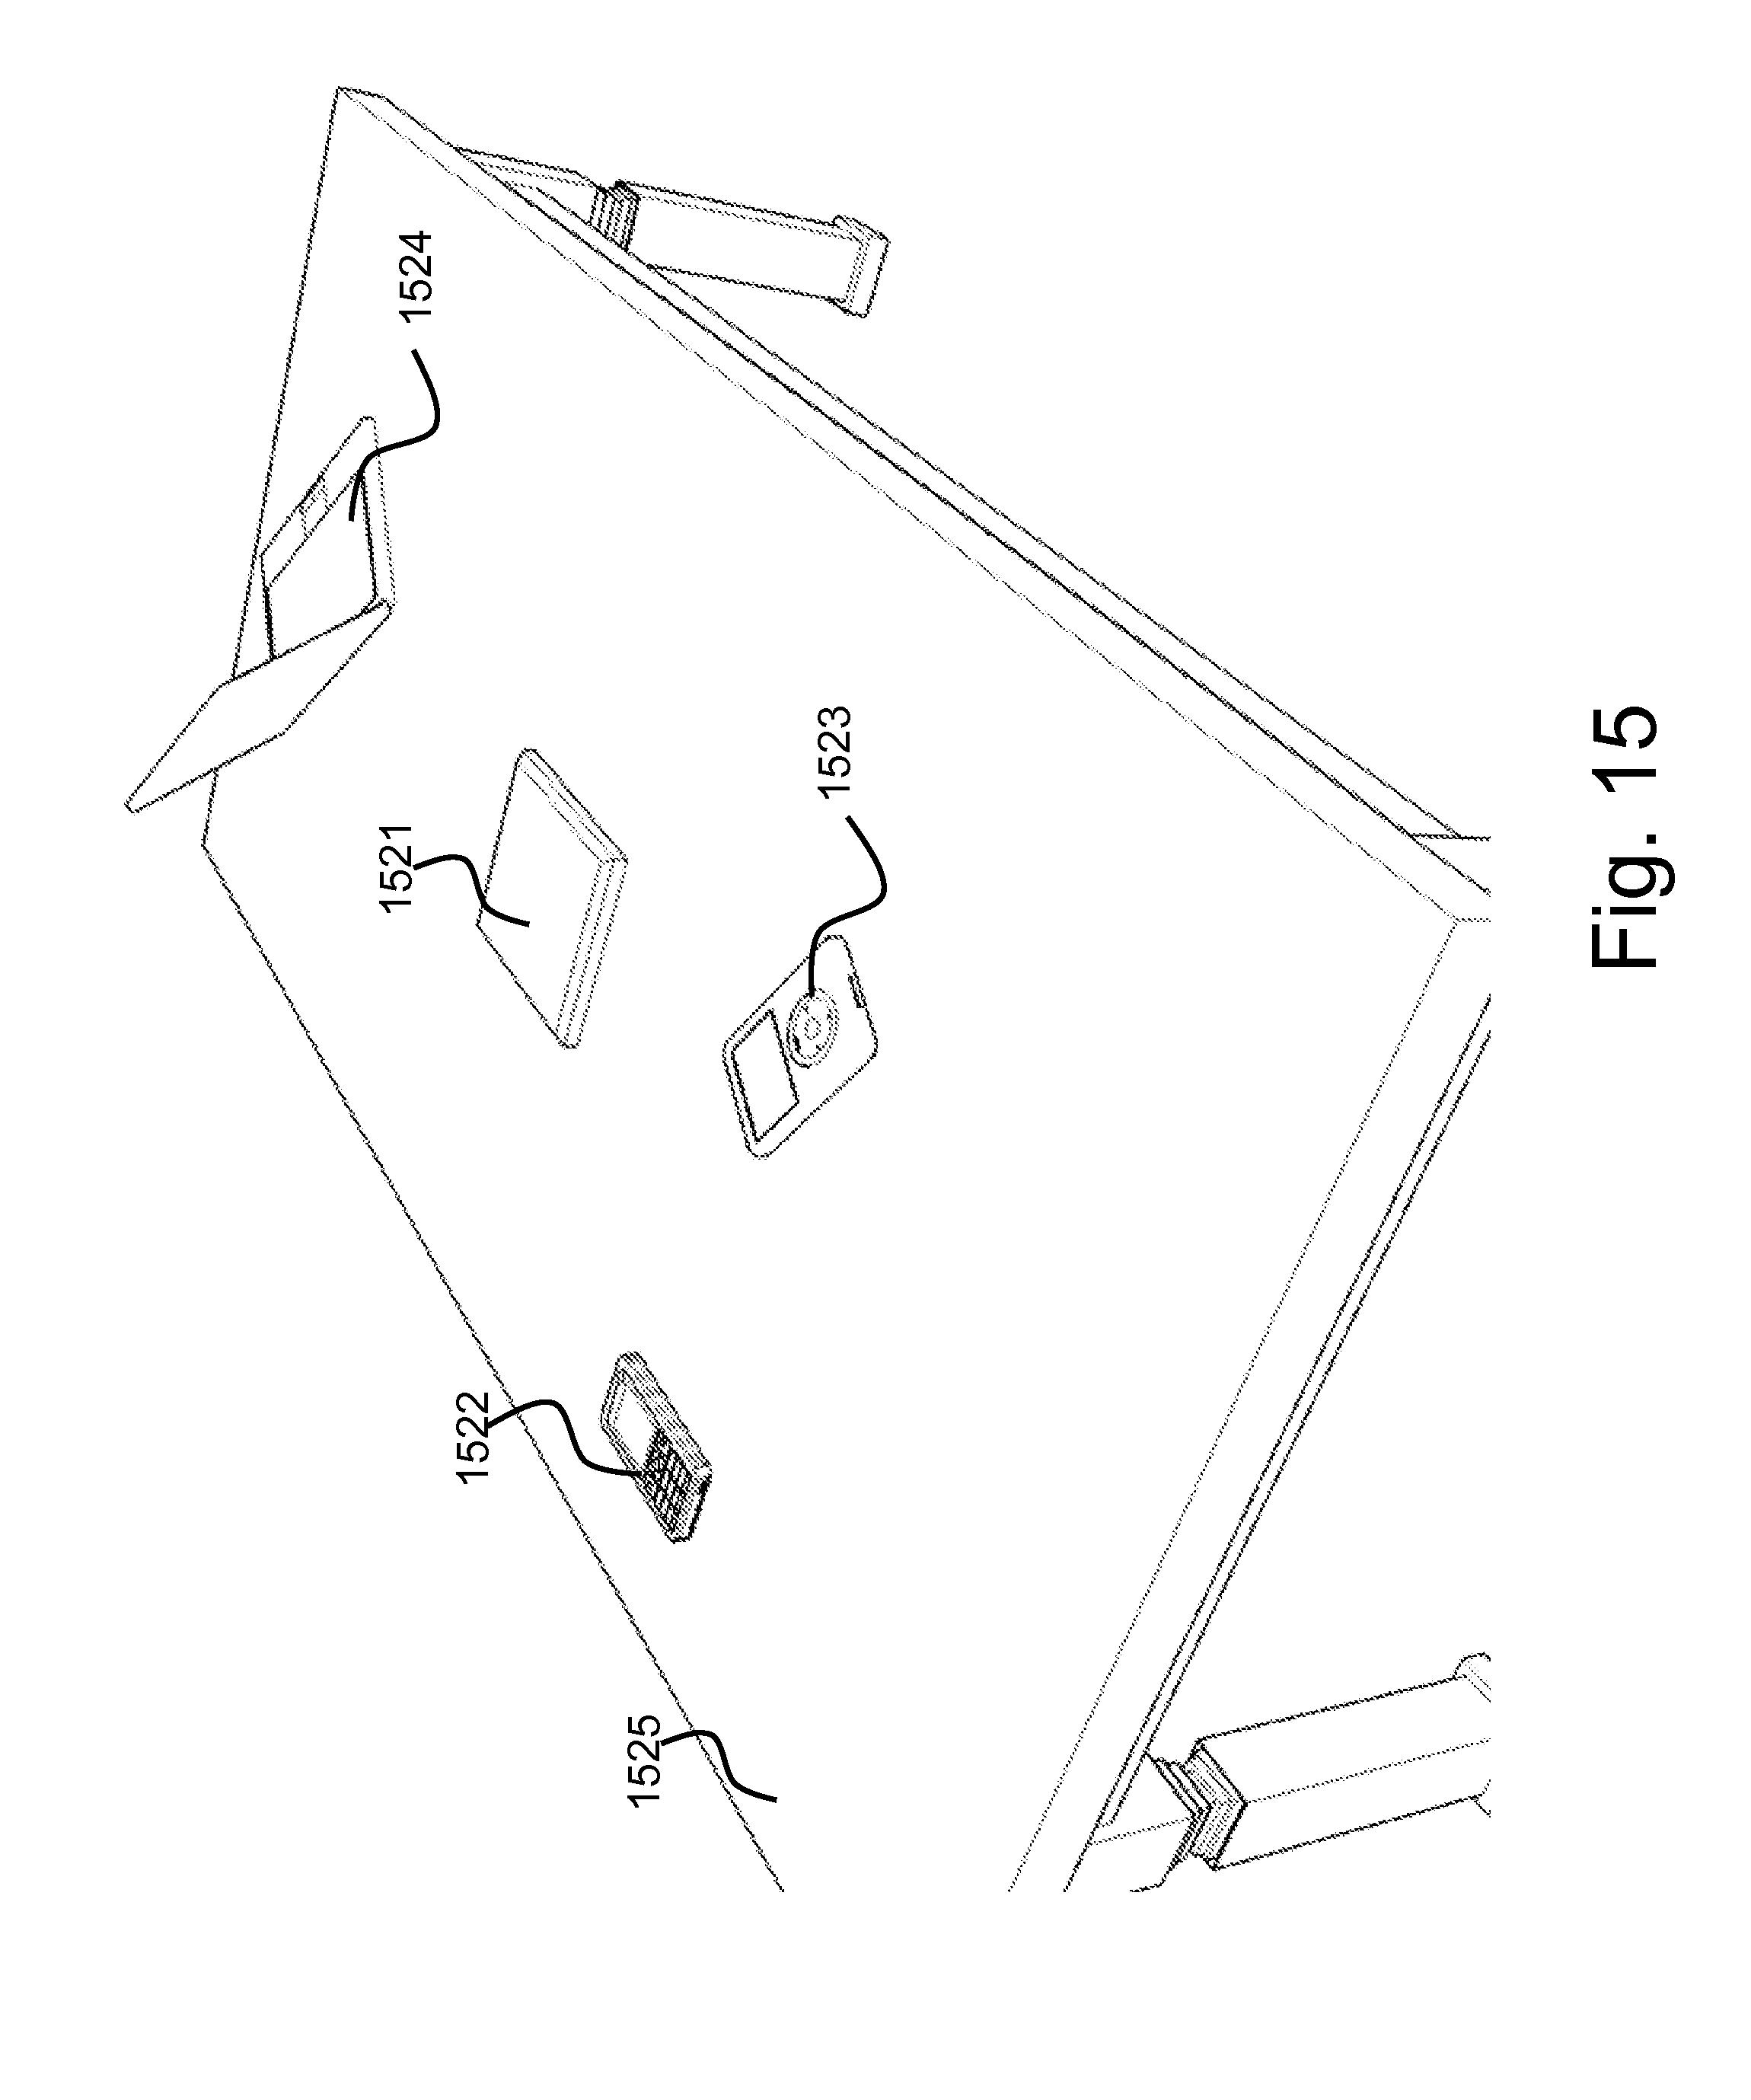 Patent Us8461722 Wireless Energy Transfer Using Conducting Water Sensor Alarm Alarmcontrol Controlcircuit Circuit Diagram Drawing